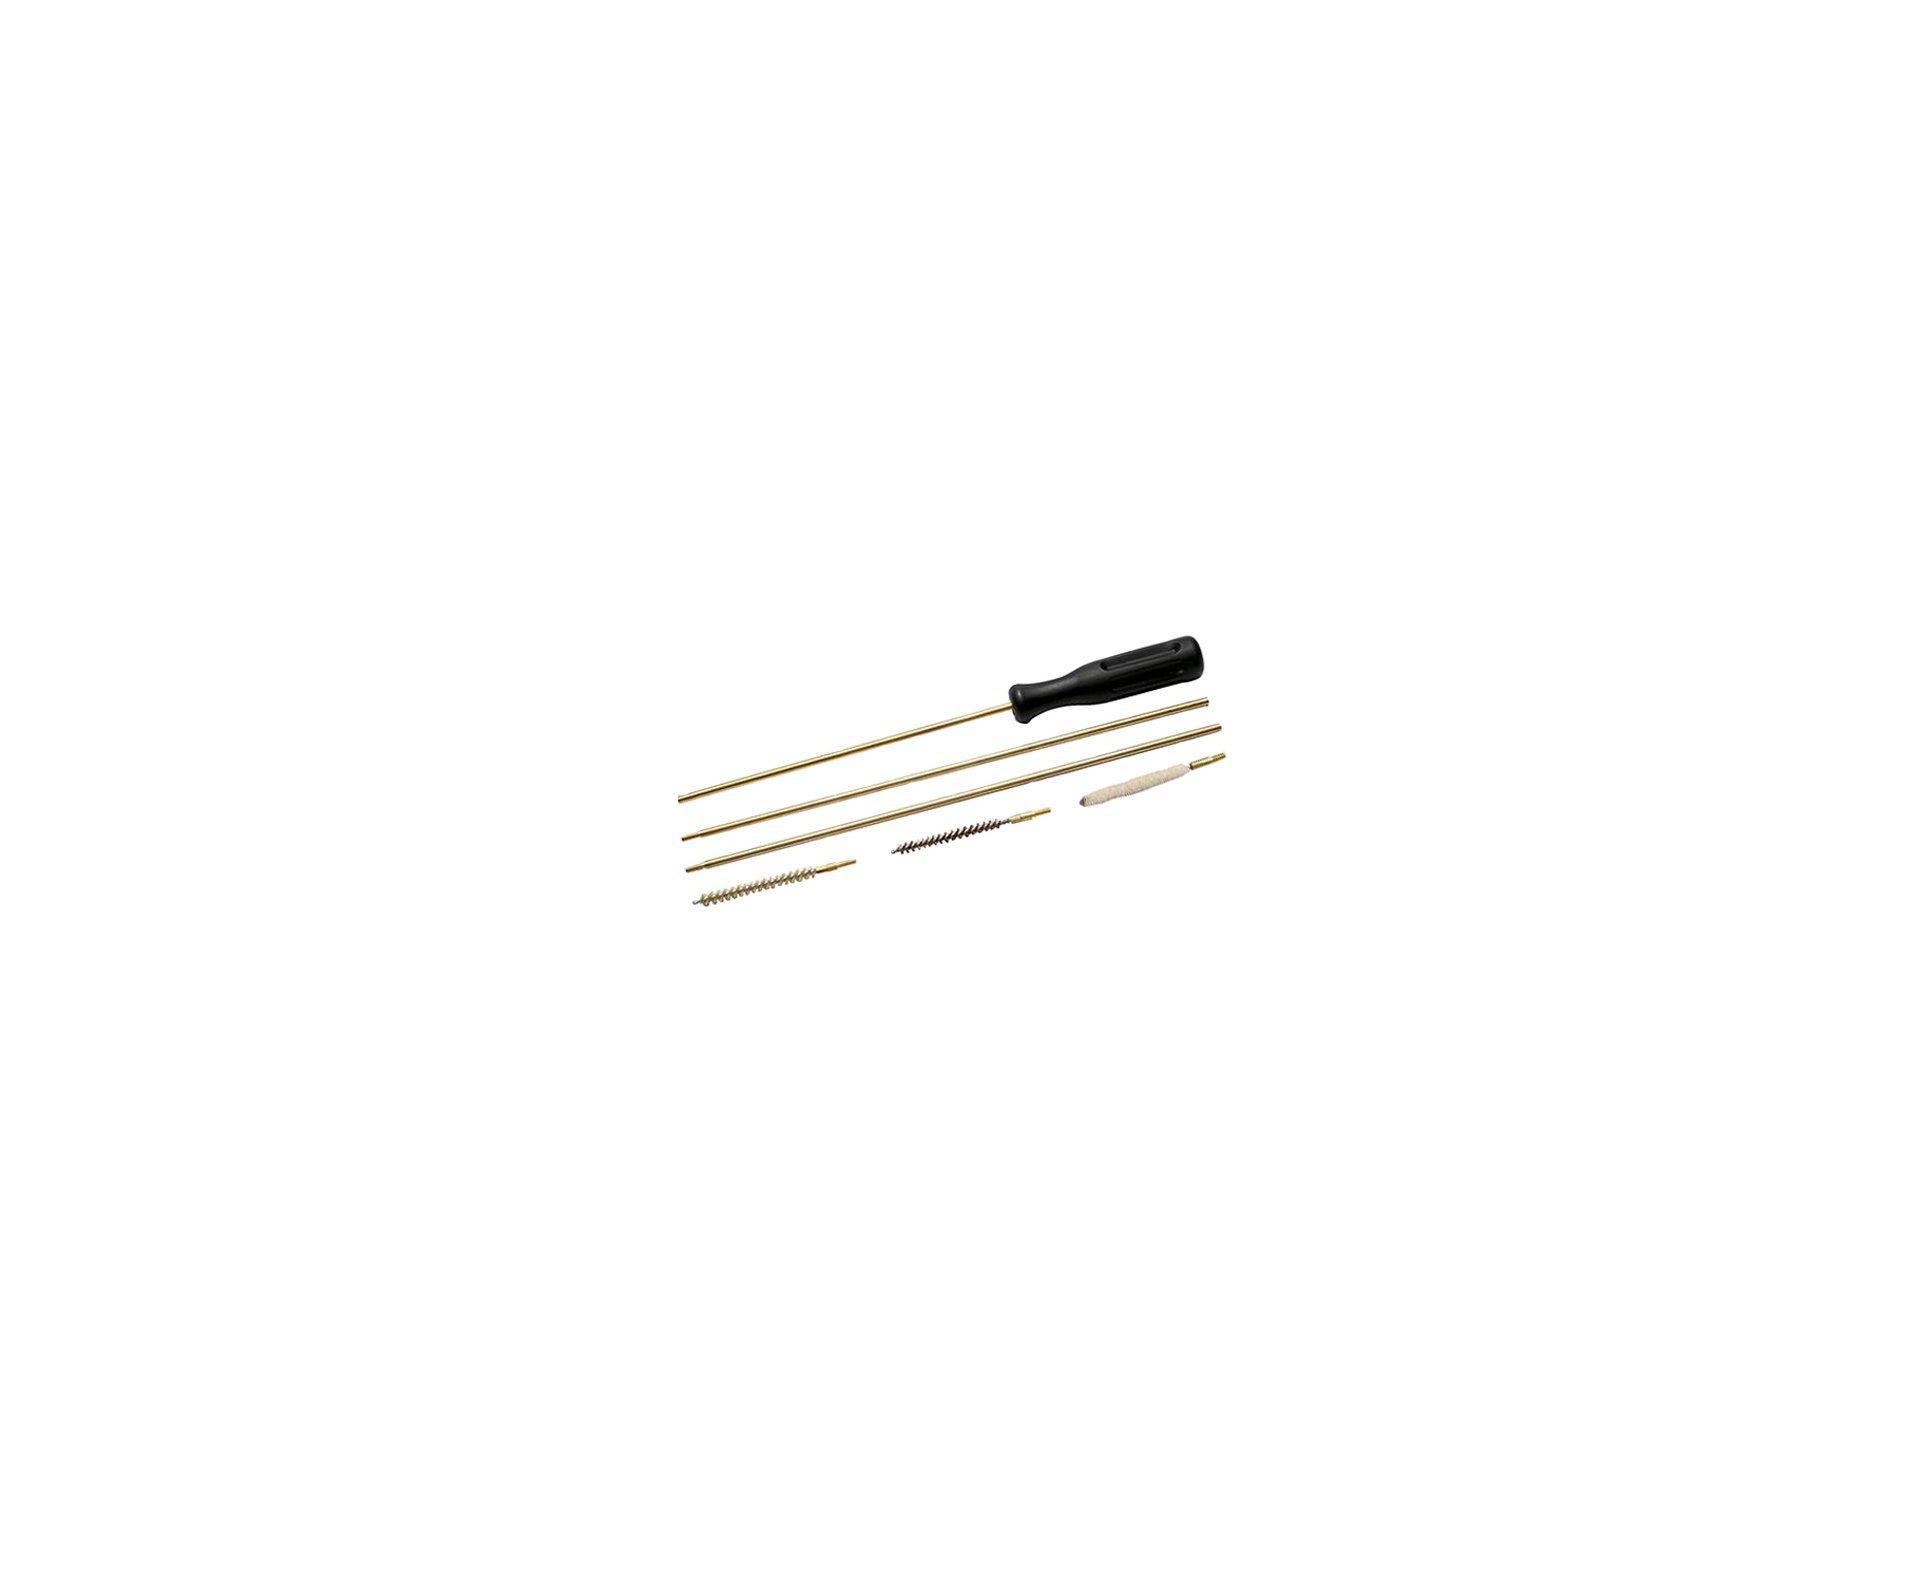 Kit De Limpeza - Calibre 6,0 Mm - Cbc